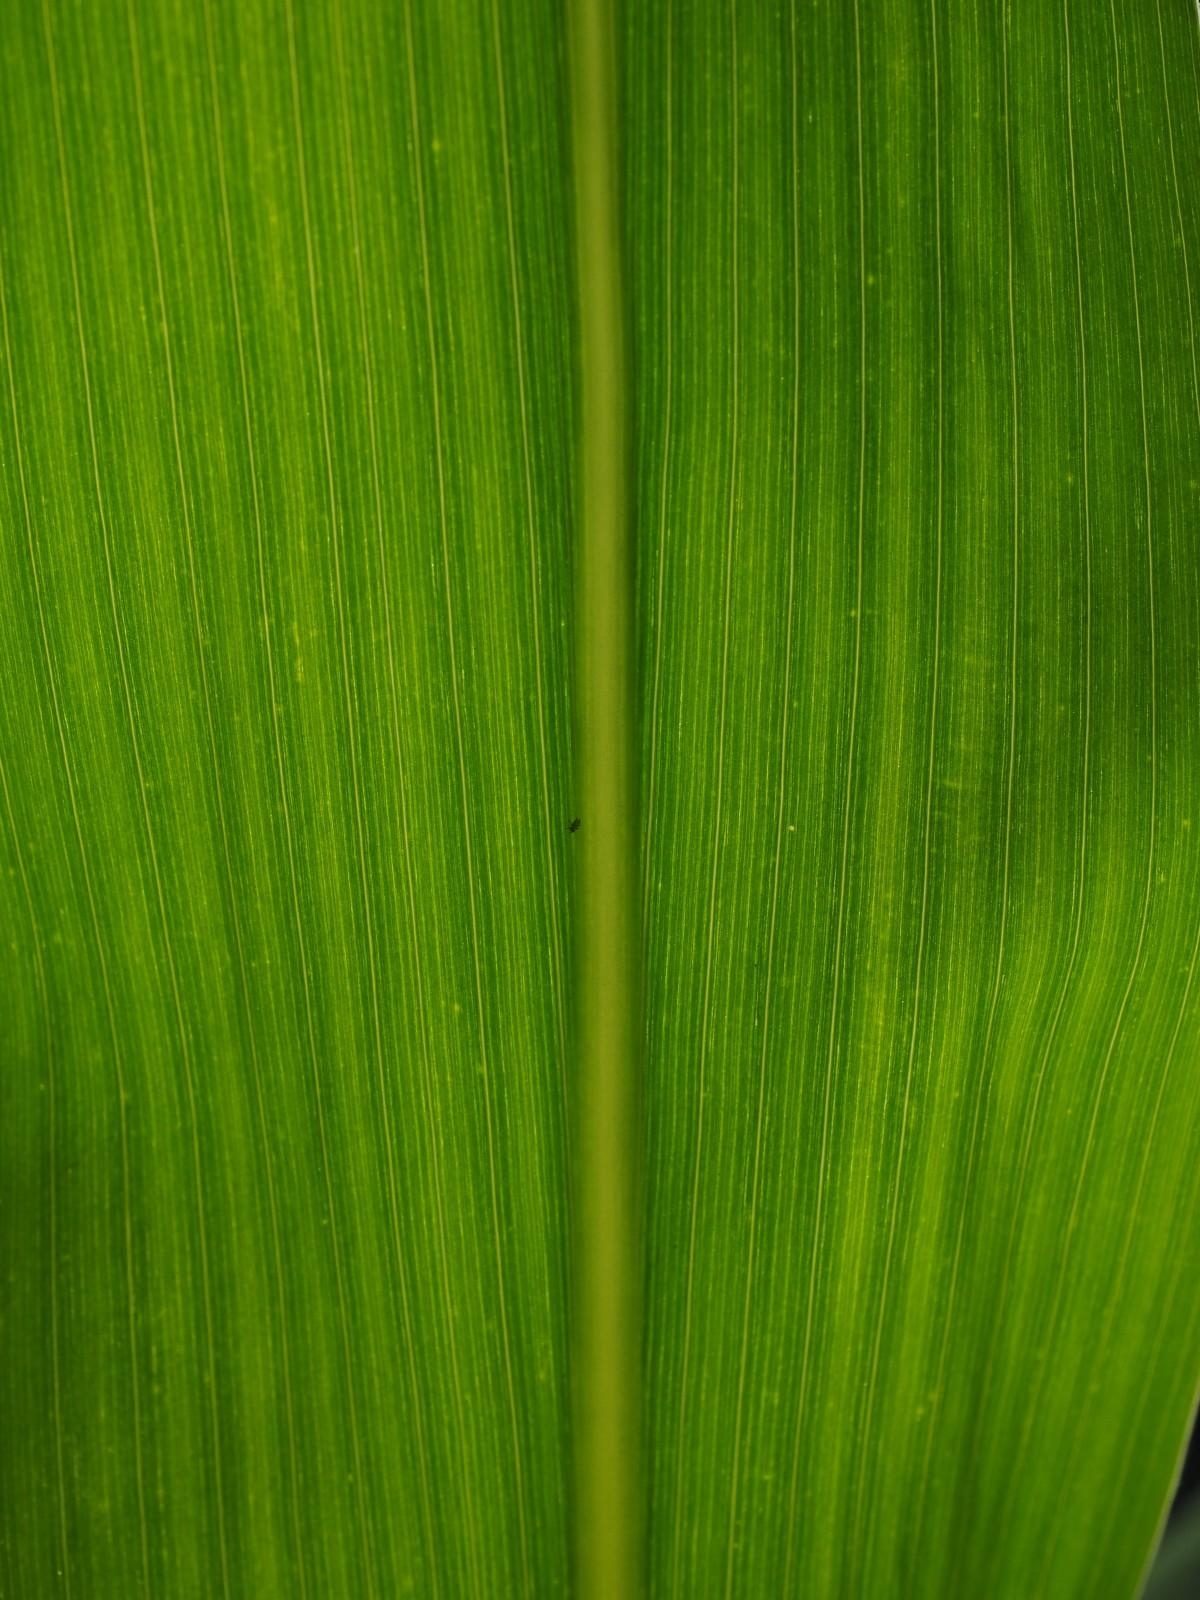 free images   lawn  flower  line  green  crop  agriculture  grassland  banana leaf  macro